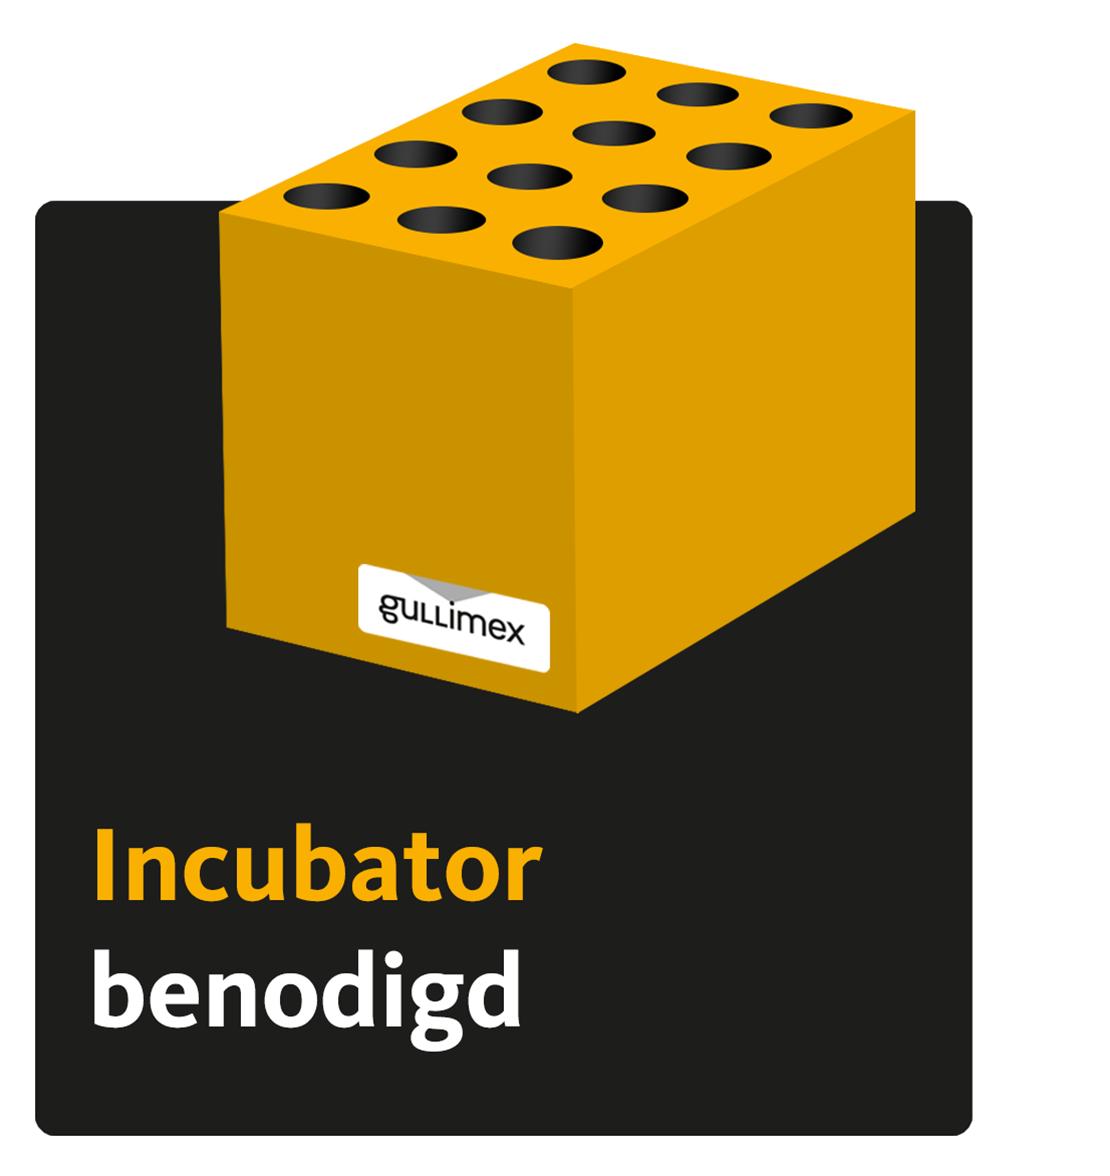 Incubator benodigd